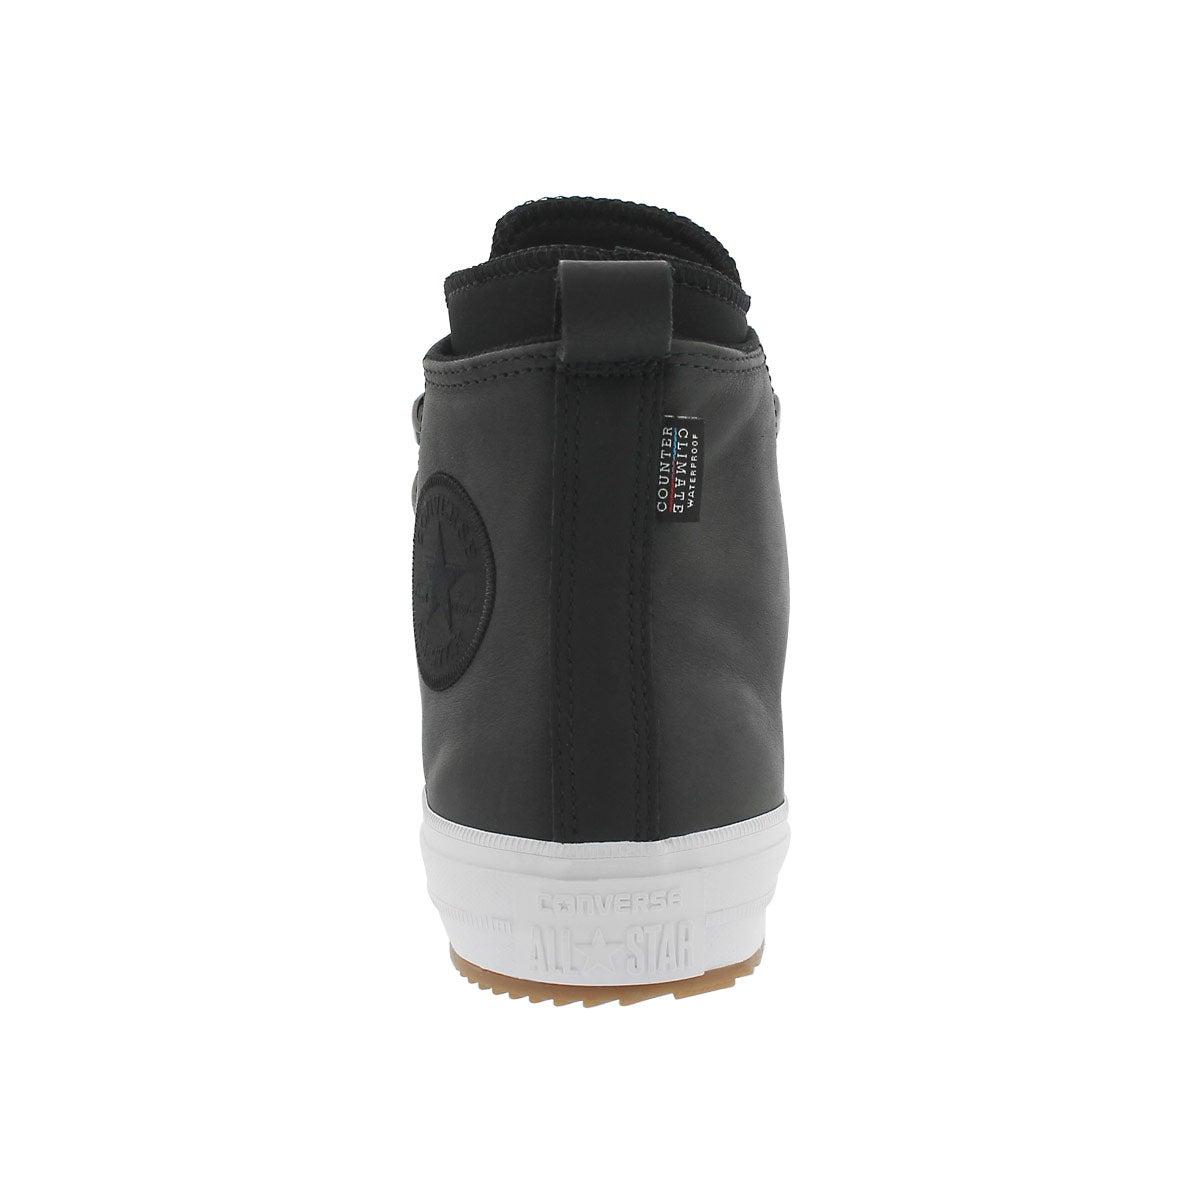 Lds CT A/S black wtpf lthr boot